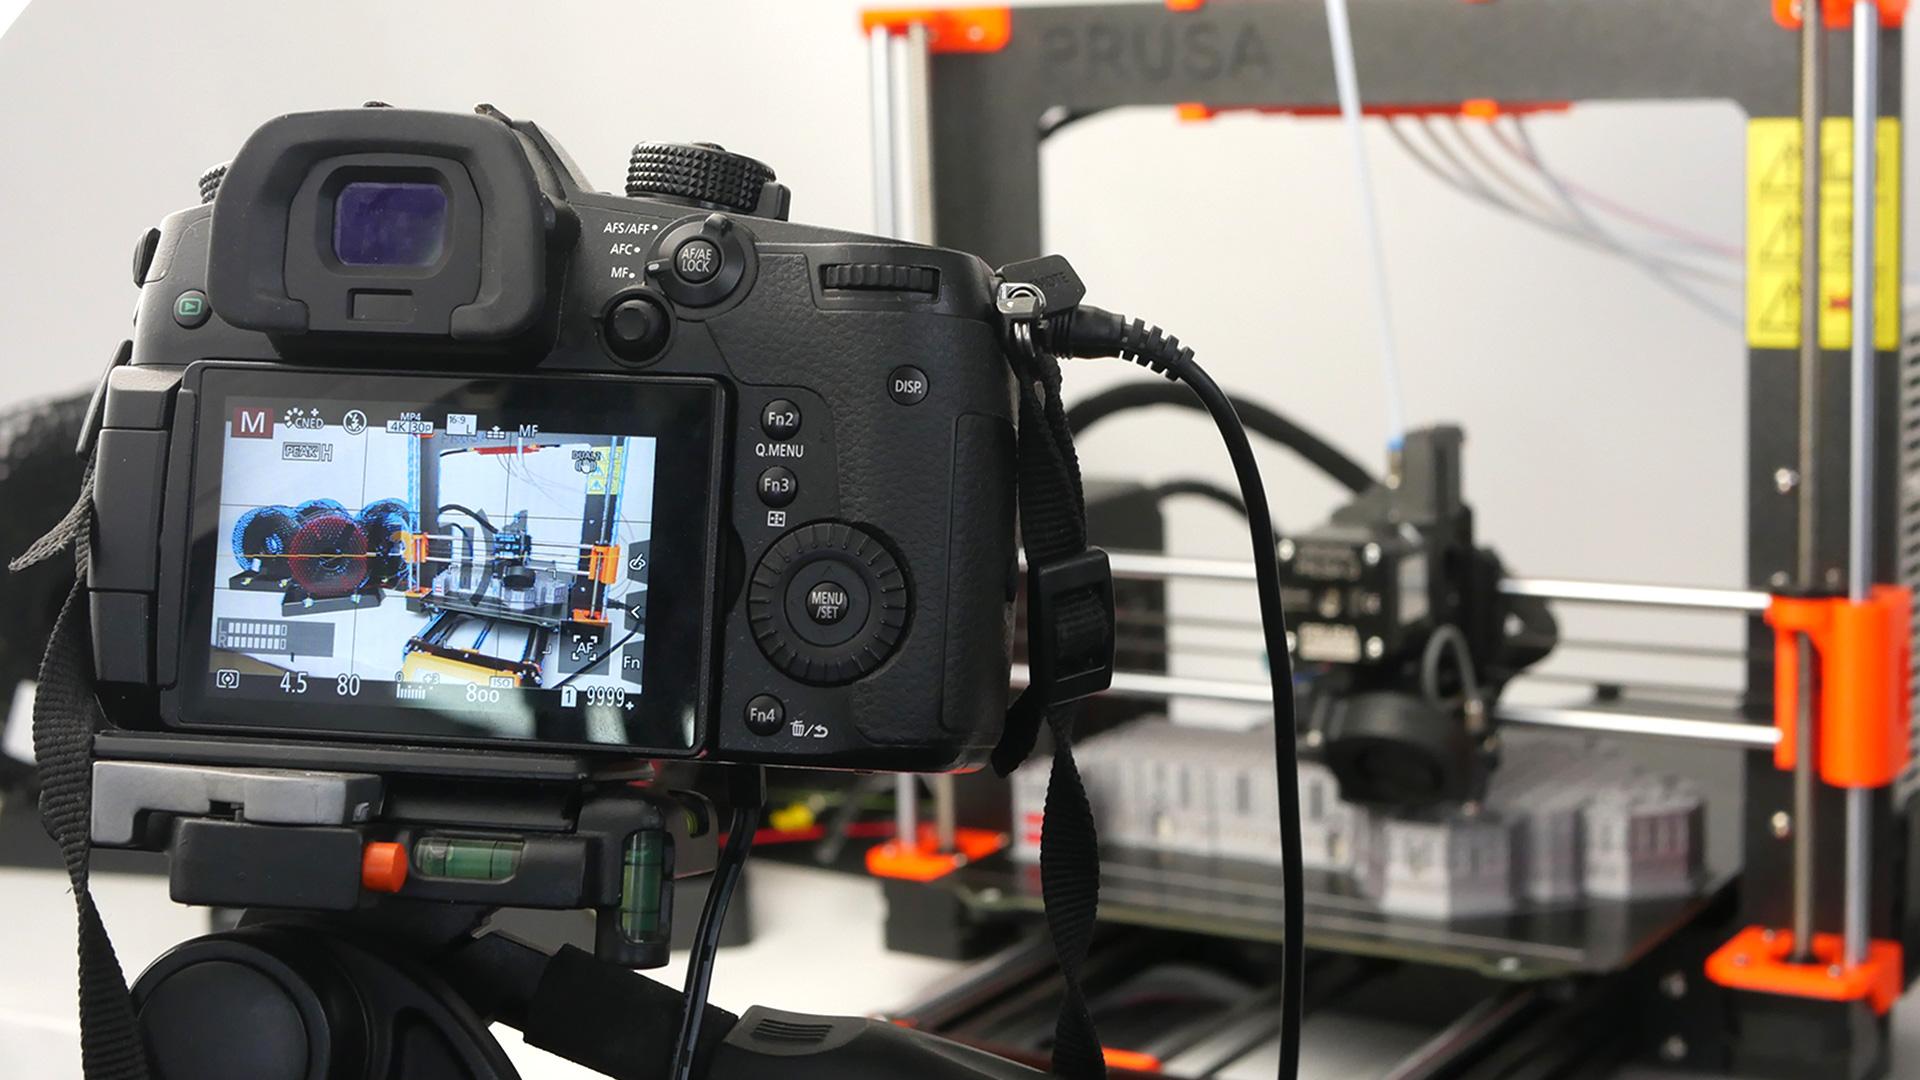 Jak na časové smyčky s 3D tiskárnami Original Prusa i3